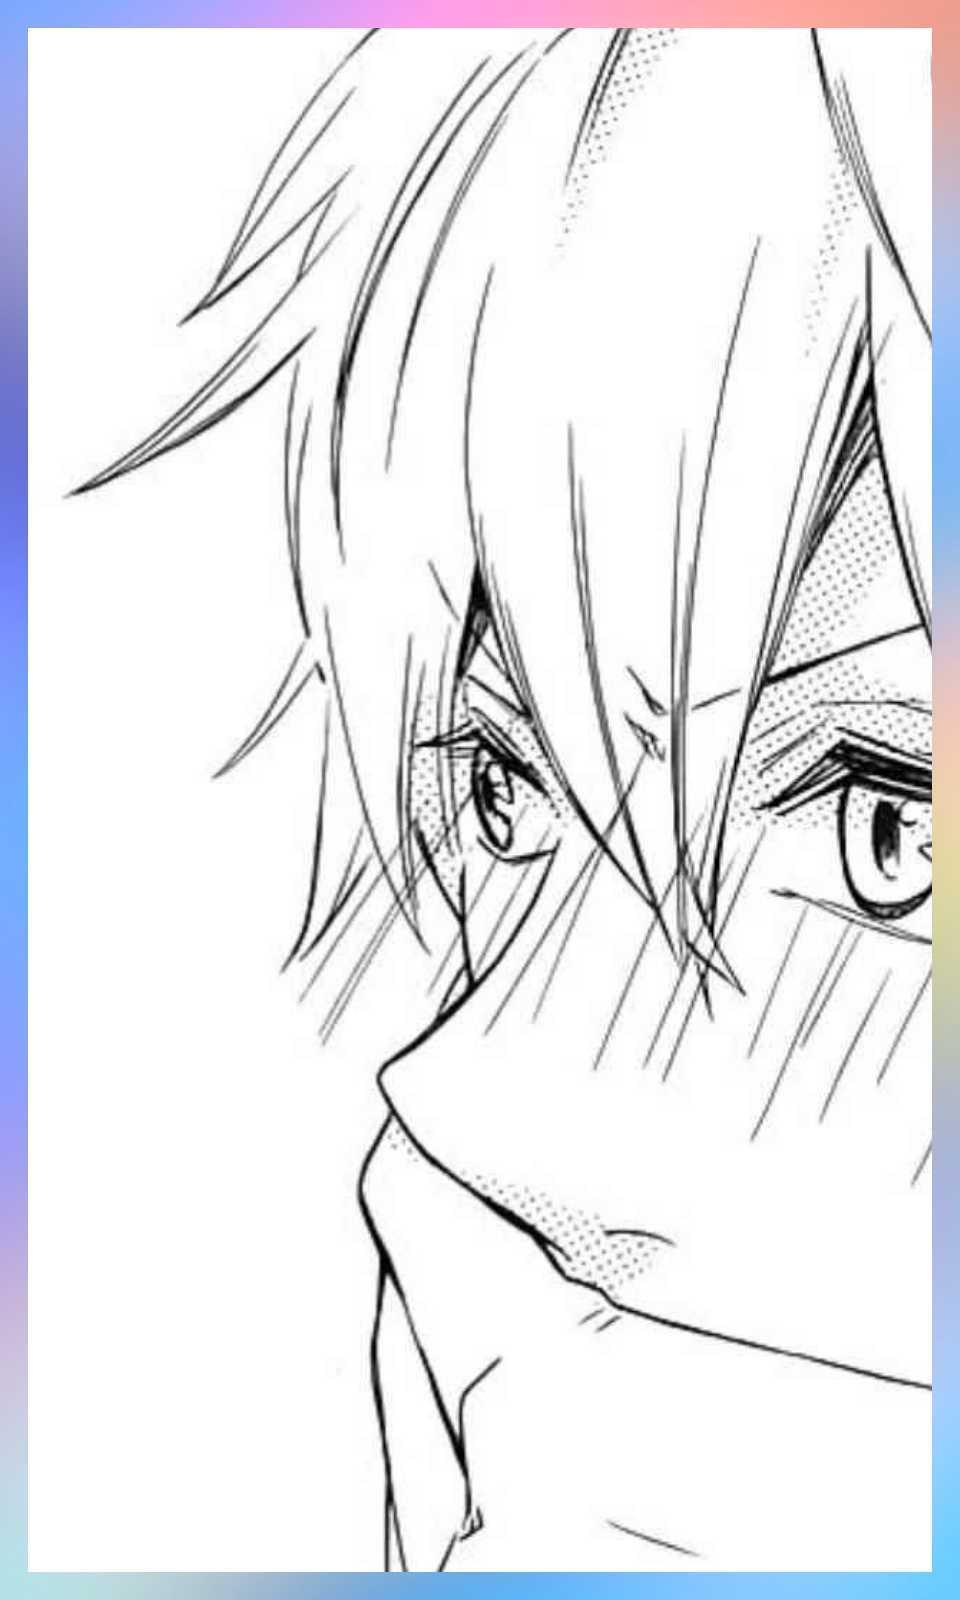 Drawing Anime Boy Ideas Kawaii Manga Sketch For Android Apk Download